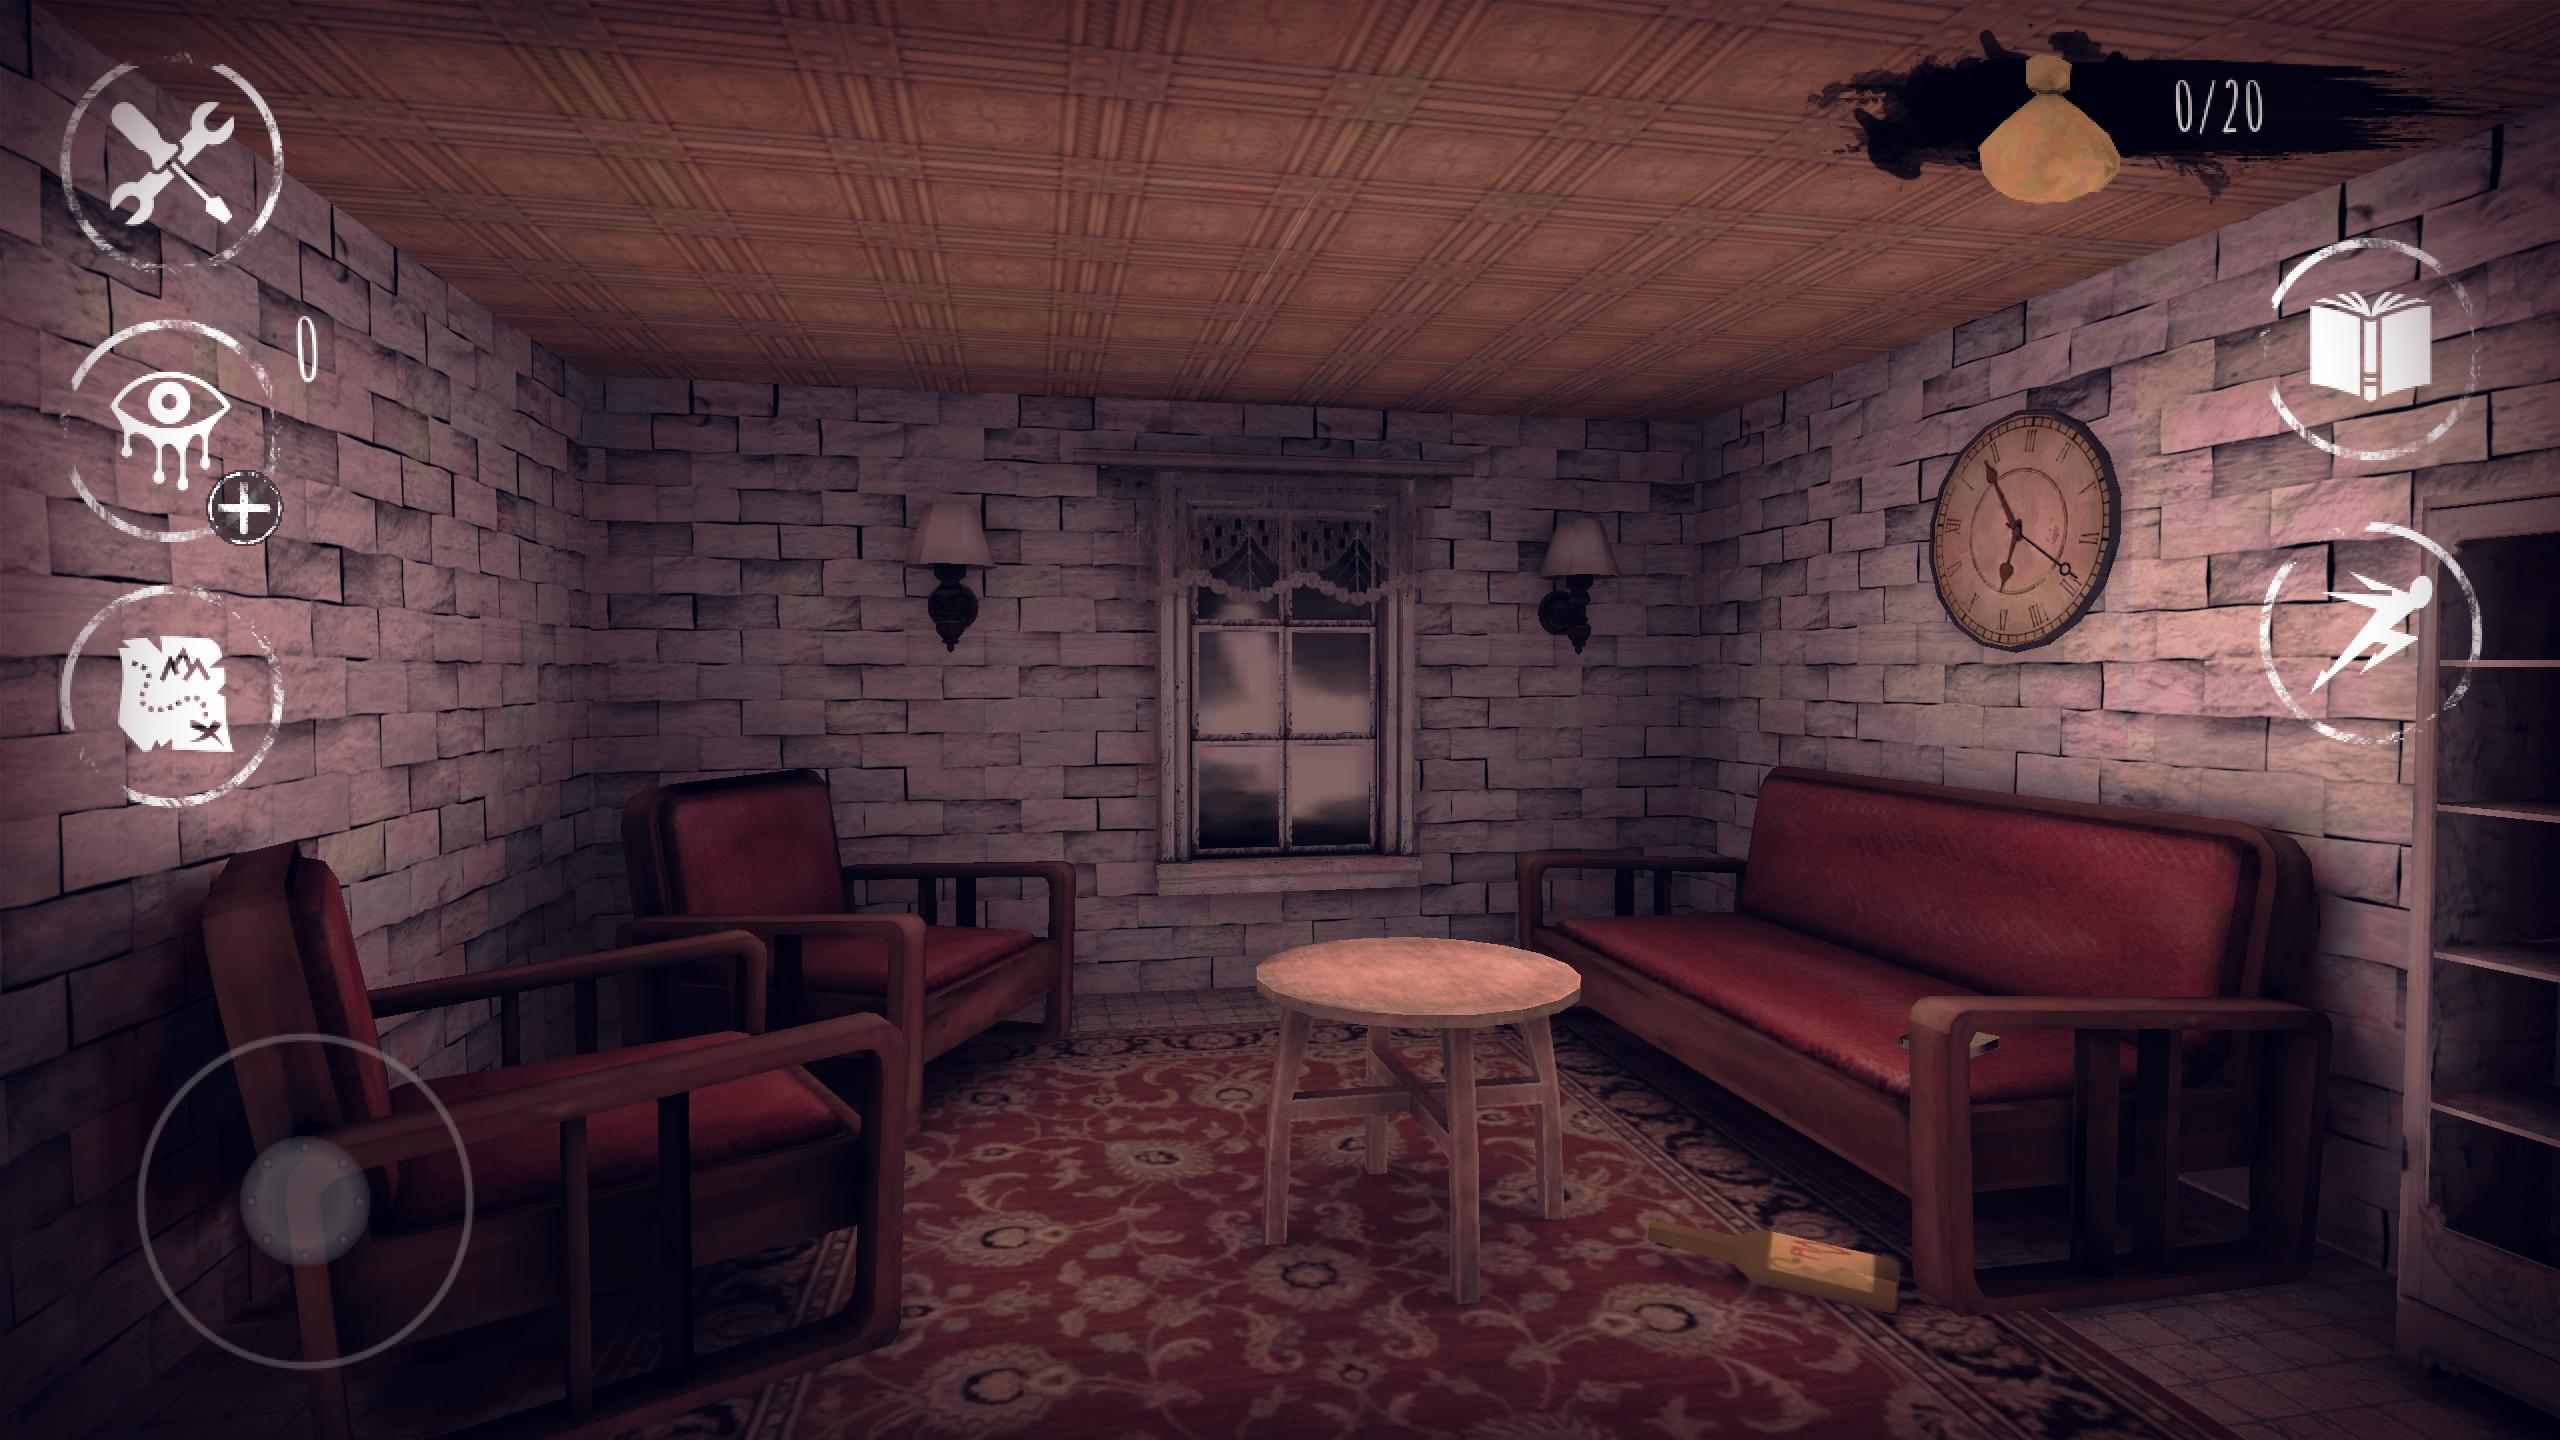 Eyes: Scary Thriller - Creepy Horror Game 6.1.21 Screenshot 5